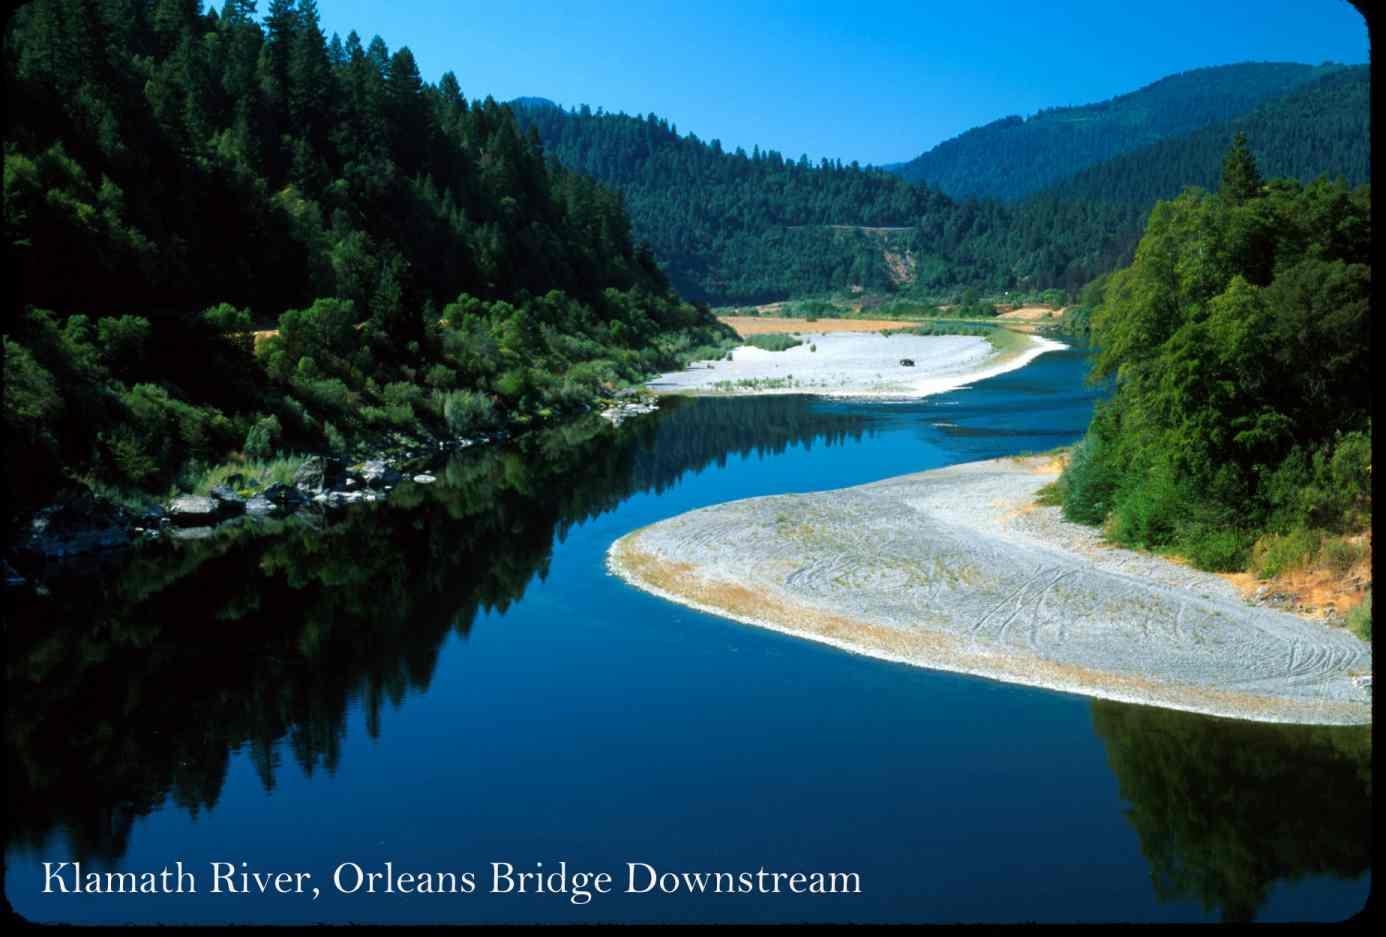 klamath_river_orleansbr_b.jpg 78K